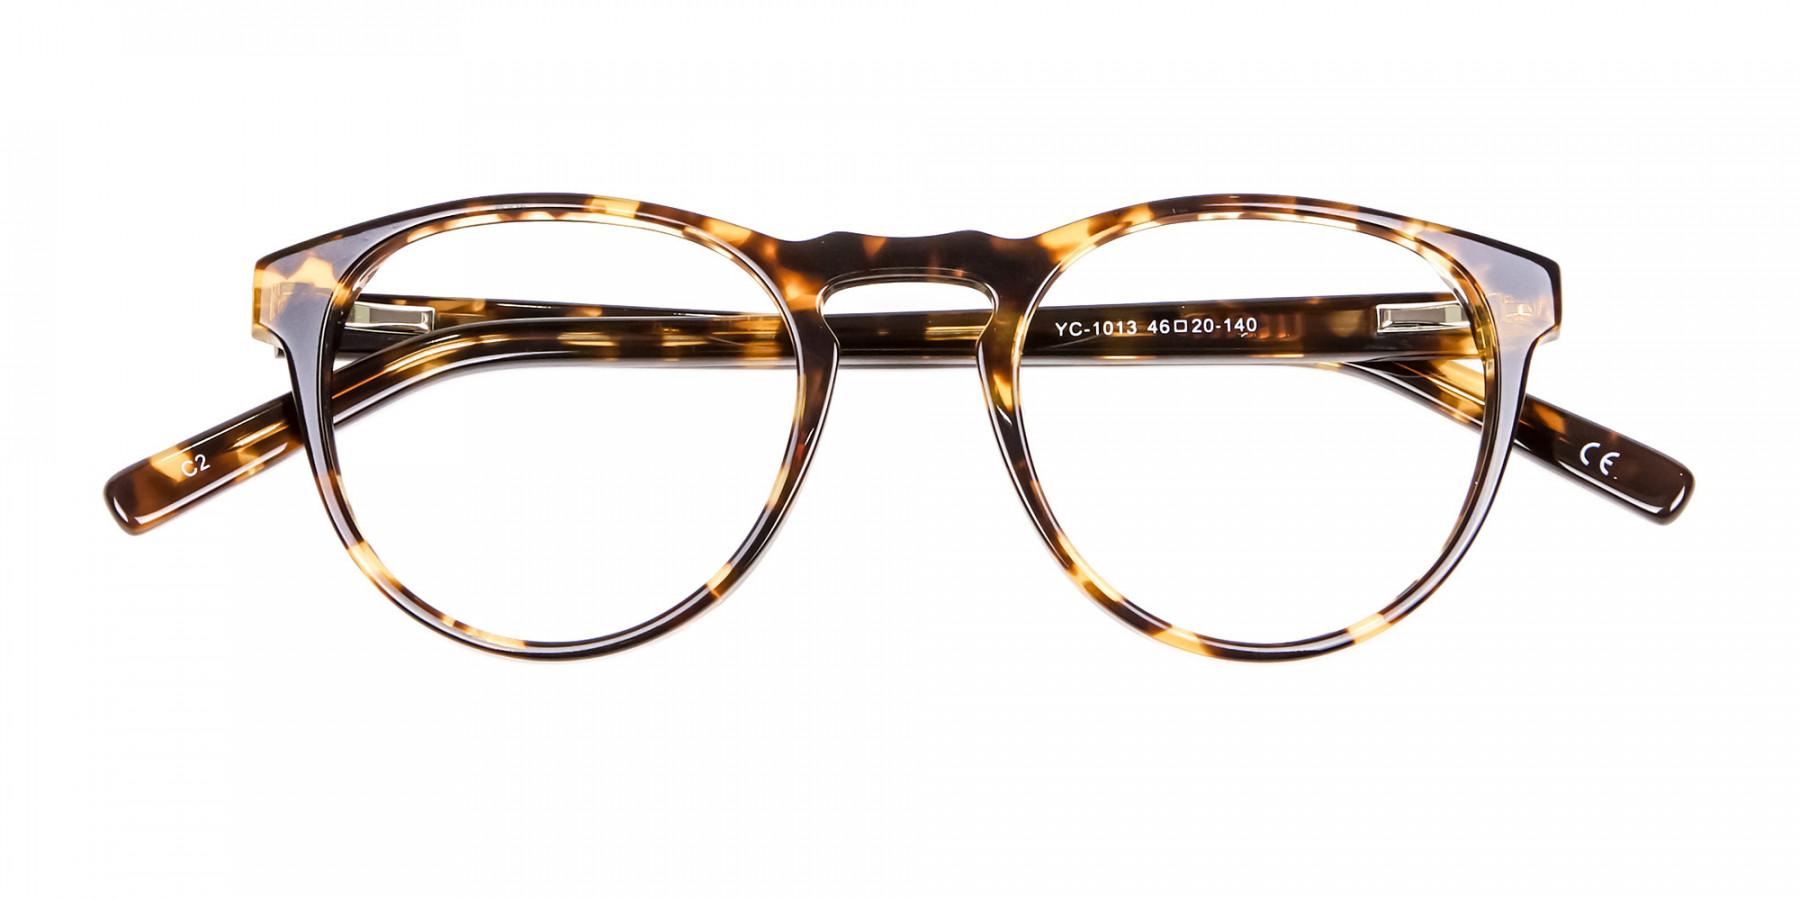 Classic Havana & Tortoiseshell Round Glasses